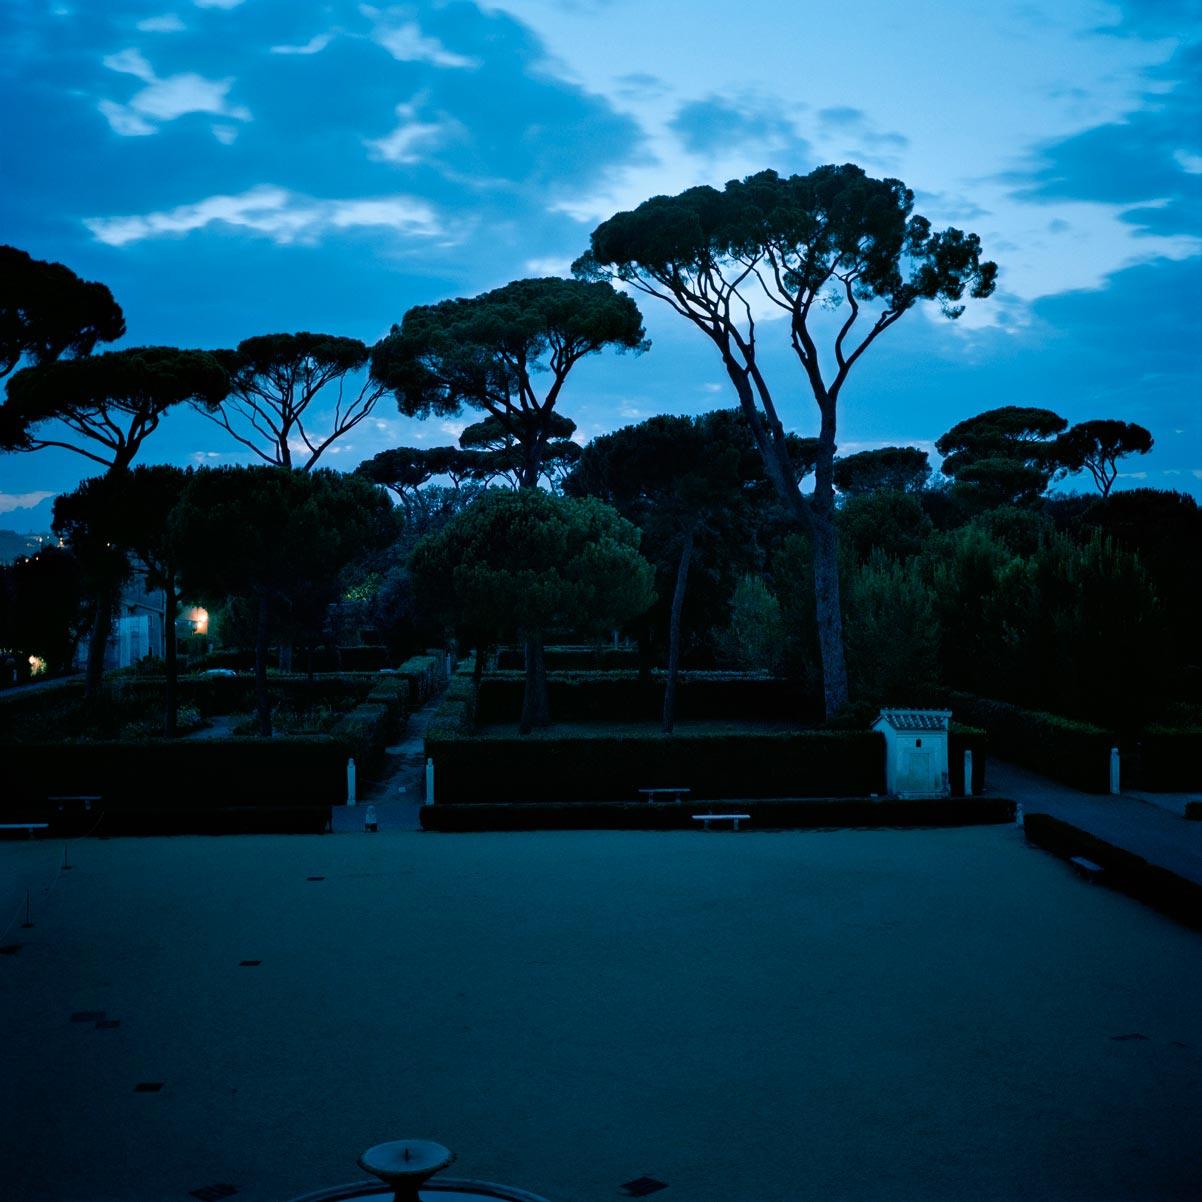 Grand-Tour-Cinecitta-Villa-Medicis-Rome-François-Halard-014